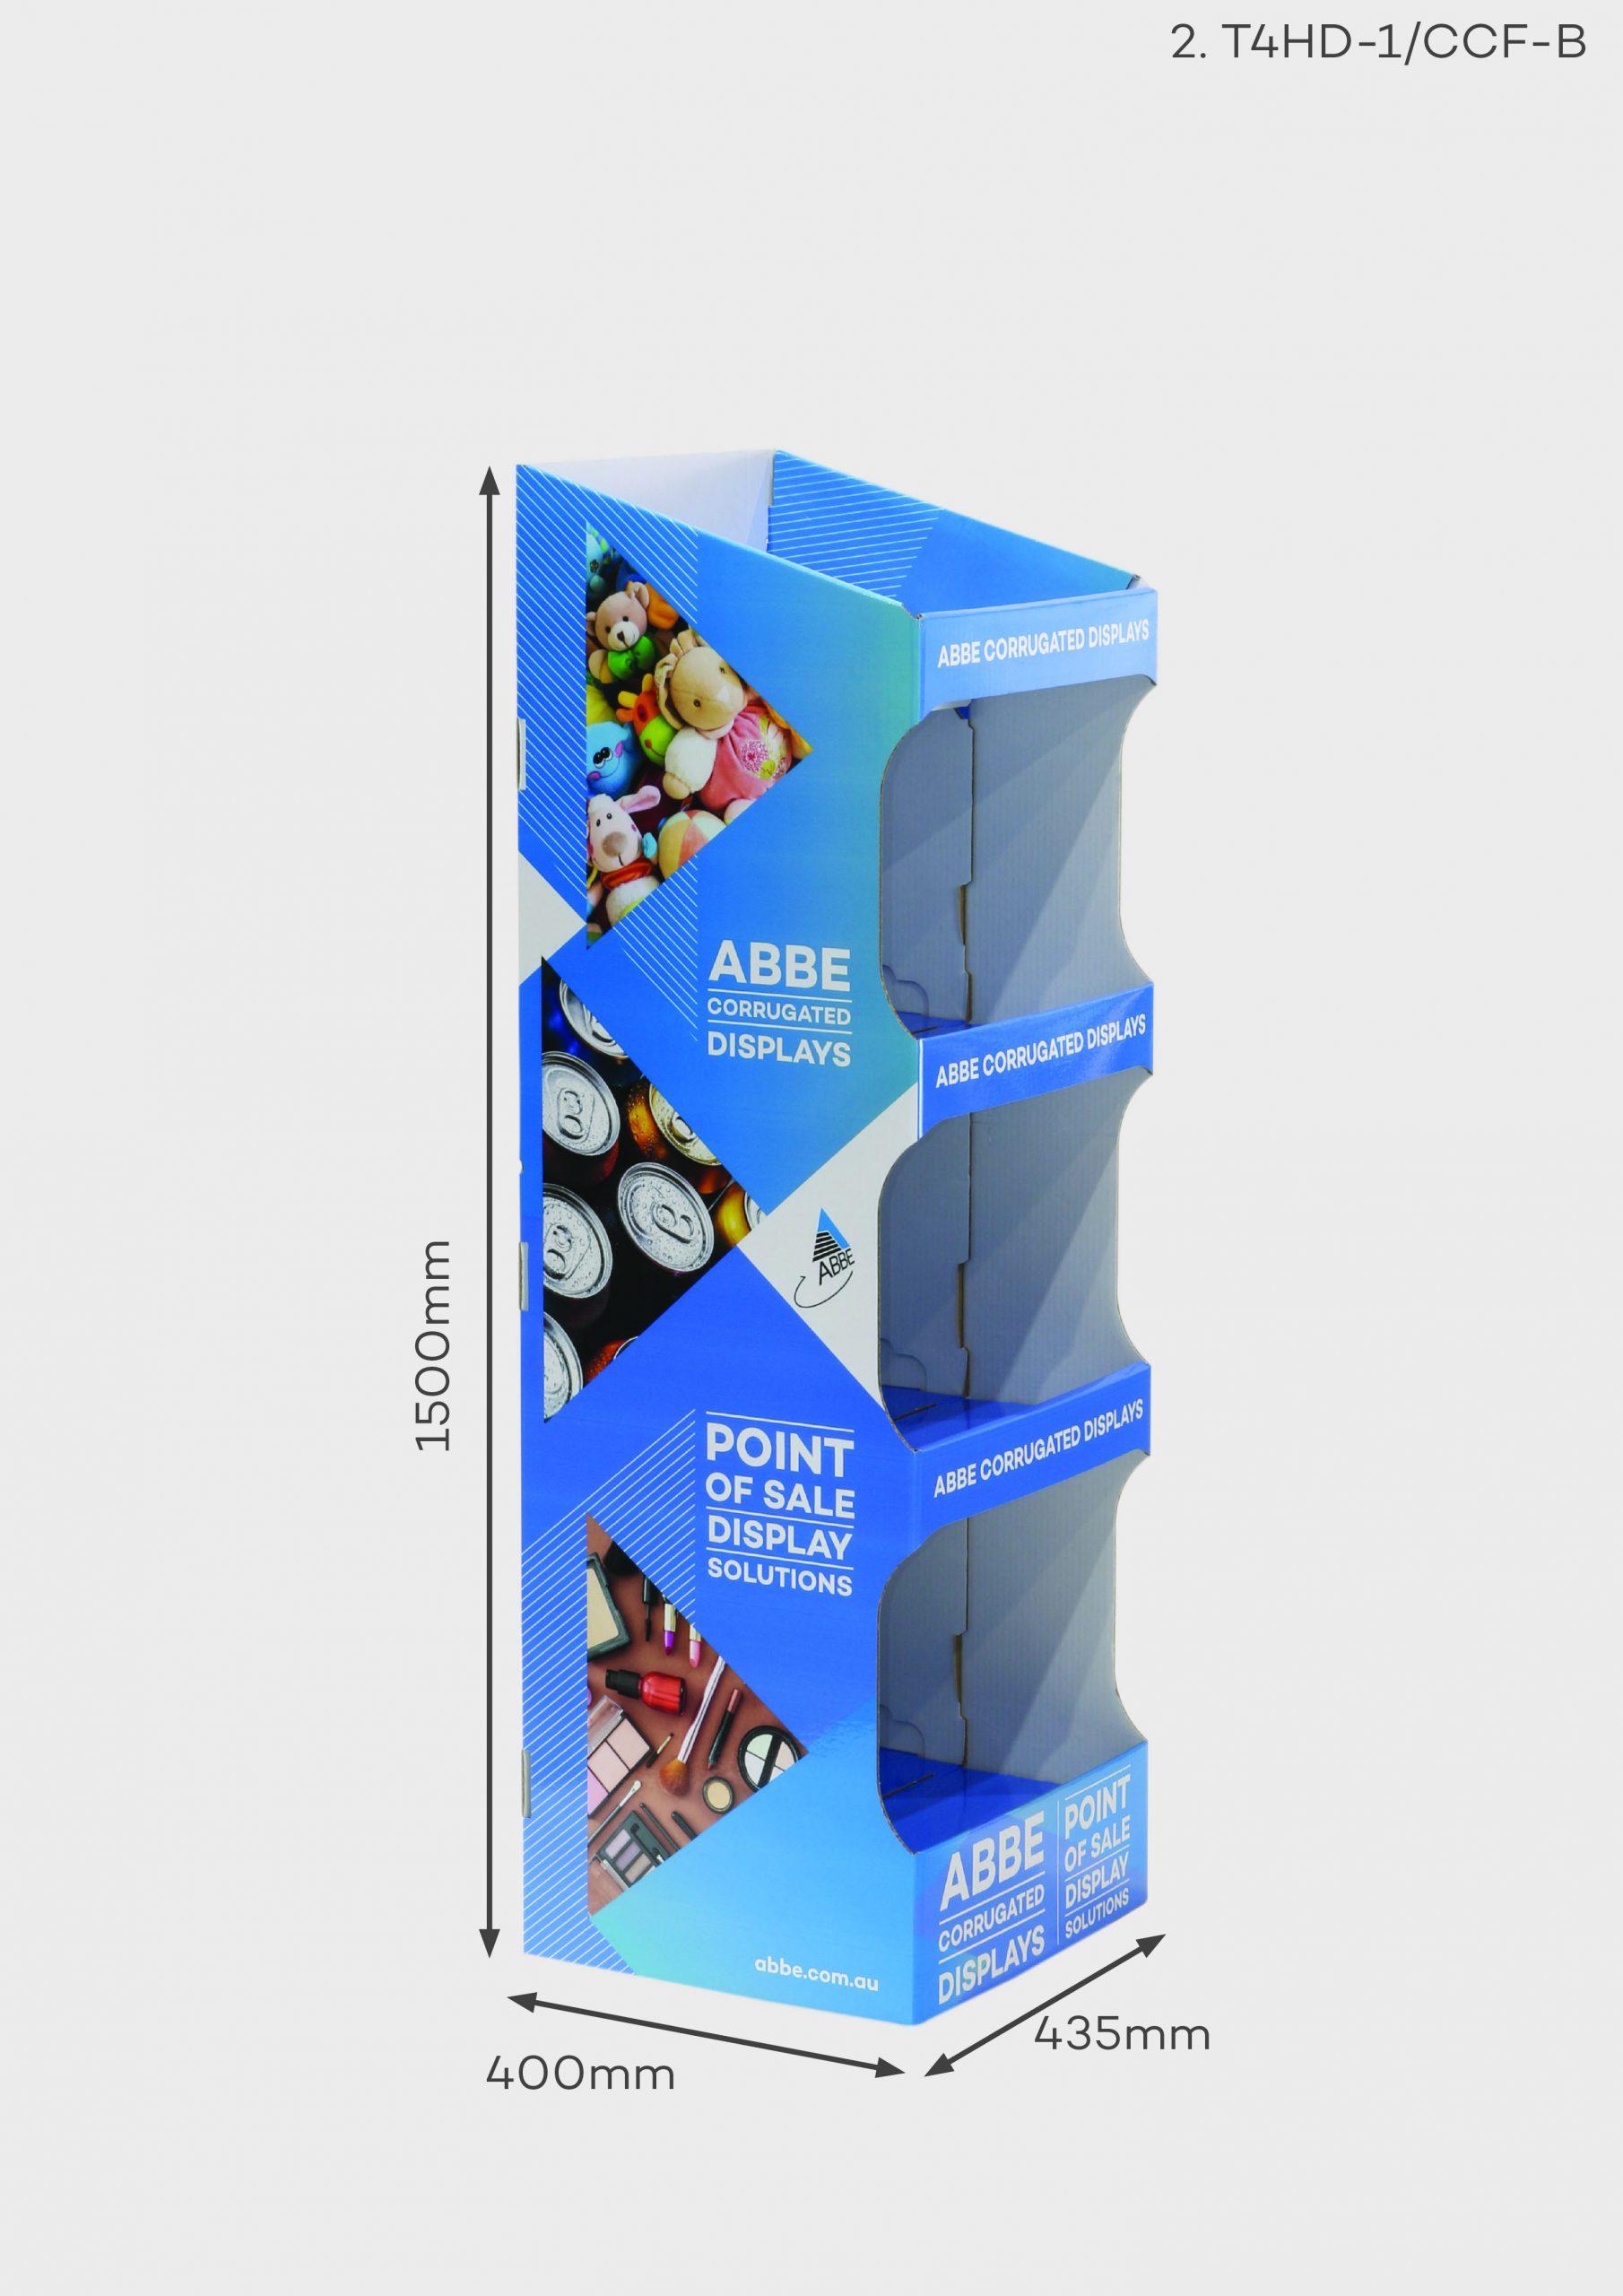 4 Shelf Large Display Unit (Ref T4HD-1/CCF-B)